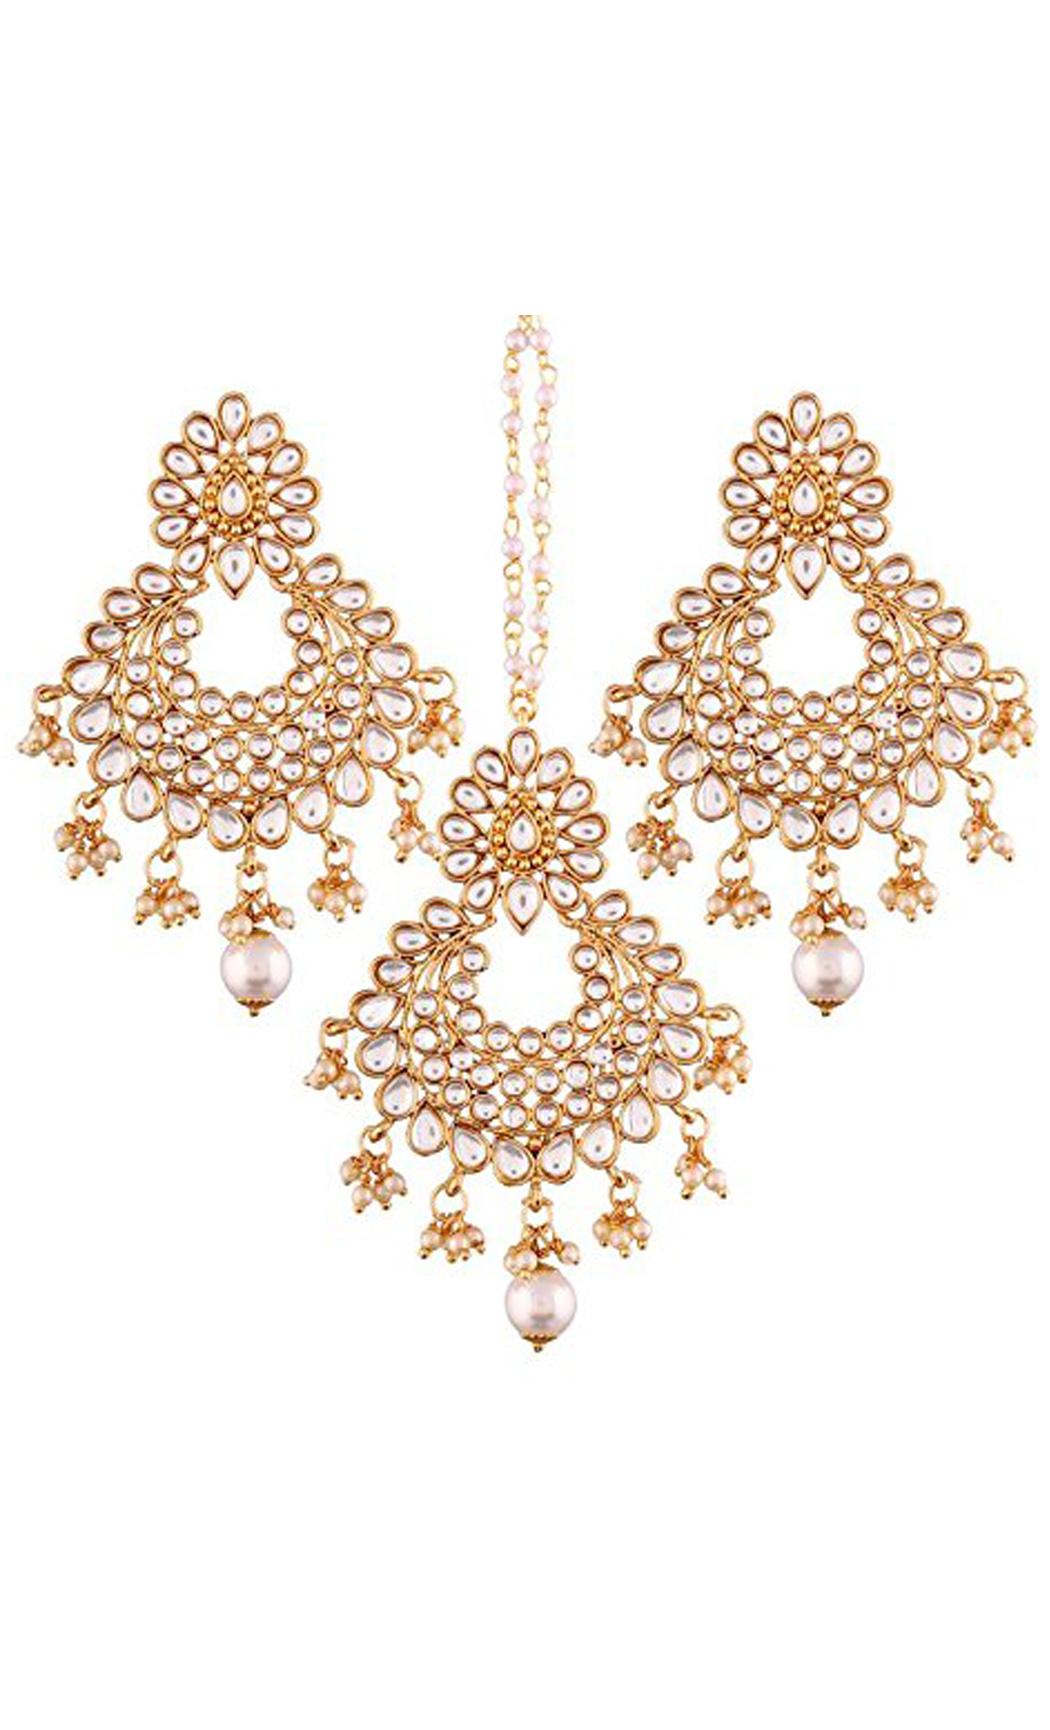 Pearl Chaandbali Earrings and Maang Tikka Gold Plated Set | Indian Bridal Jewellery Collection